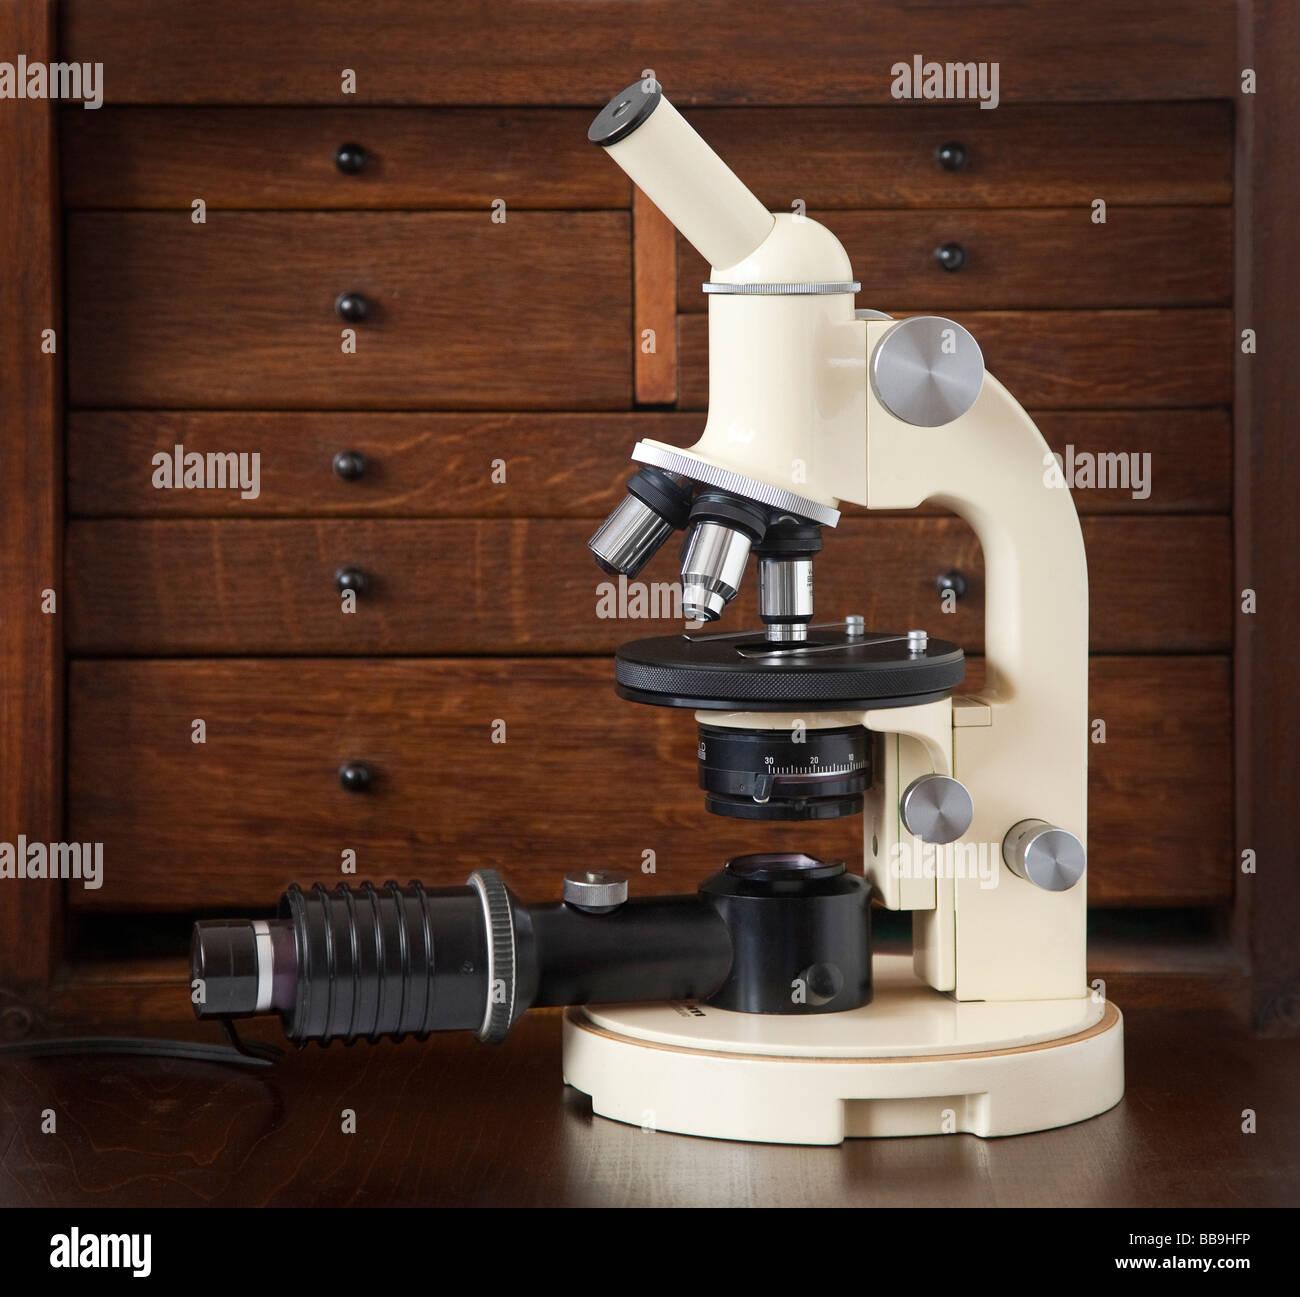 Wild Heerbrugg M11 compound microscope (1954), wooden drawers background, kohler lighting unit - Stock Image